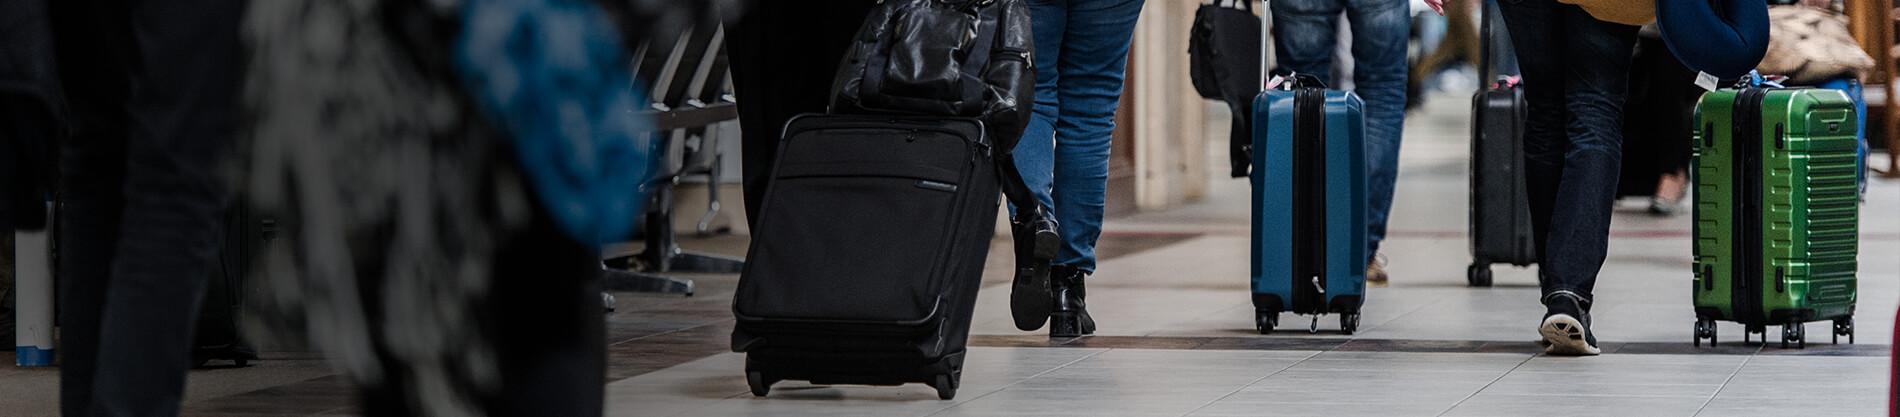 Savannah Airport Arrivals & Departures Hilton Head Airport